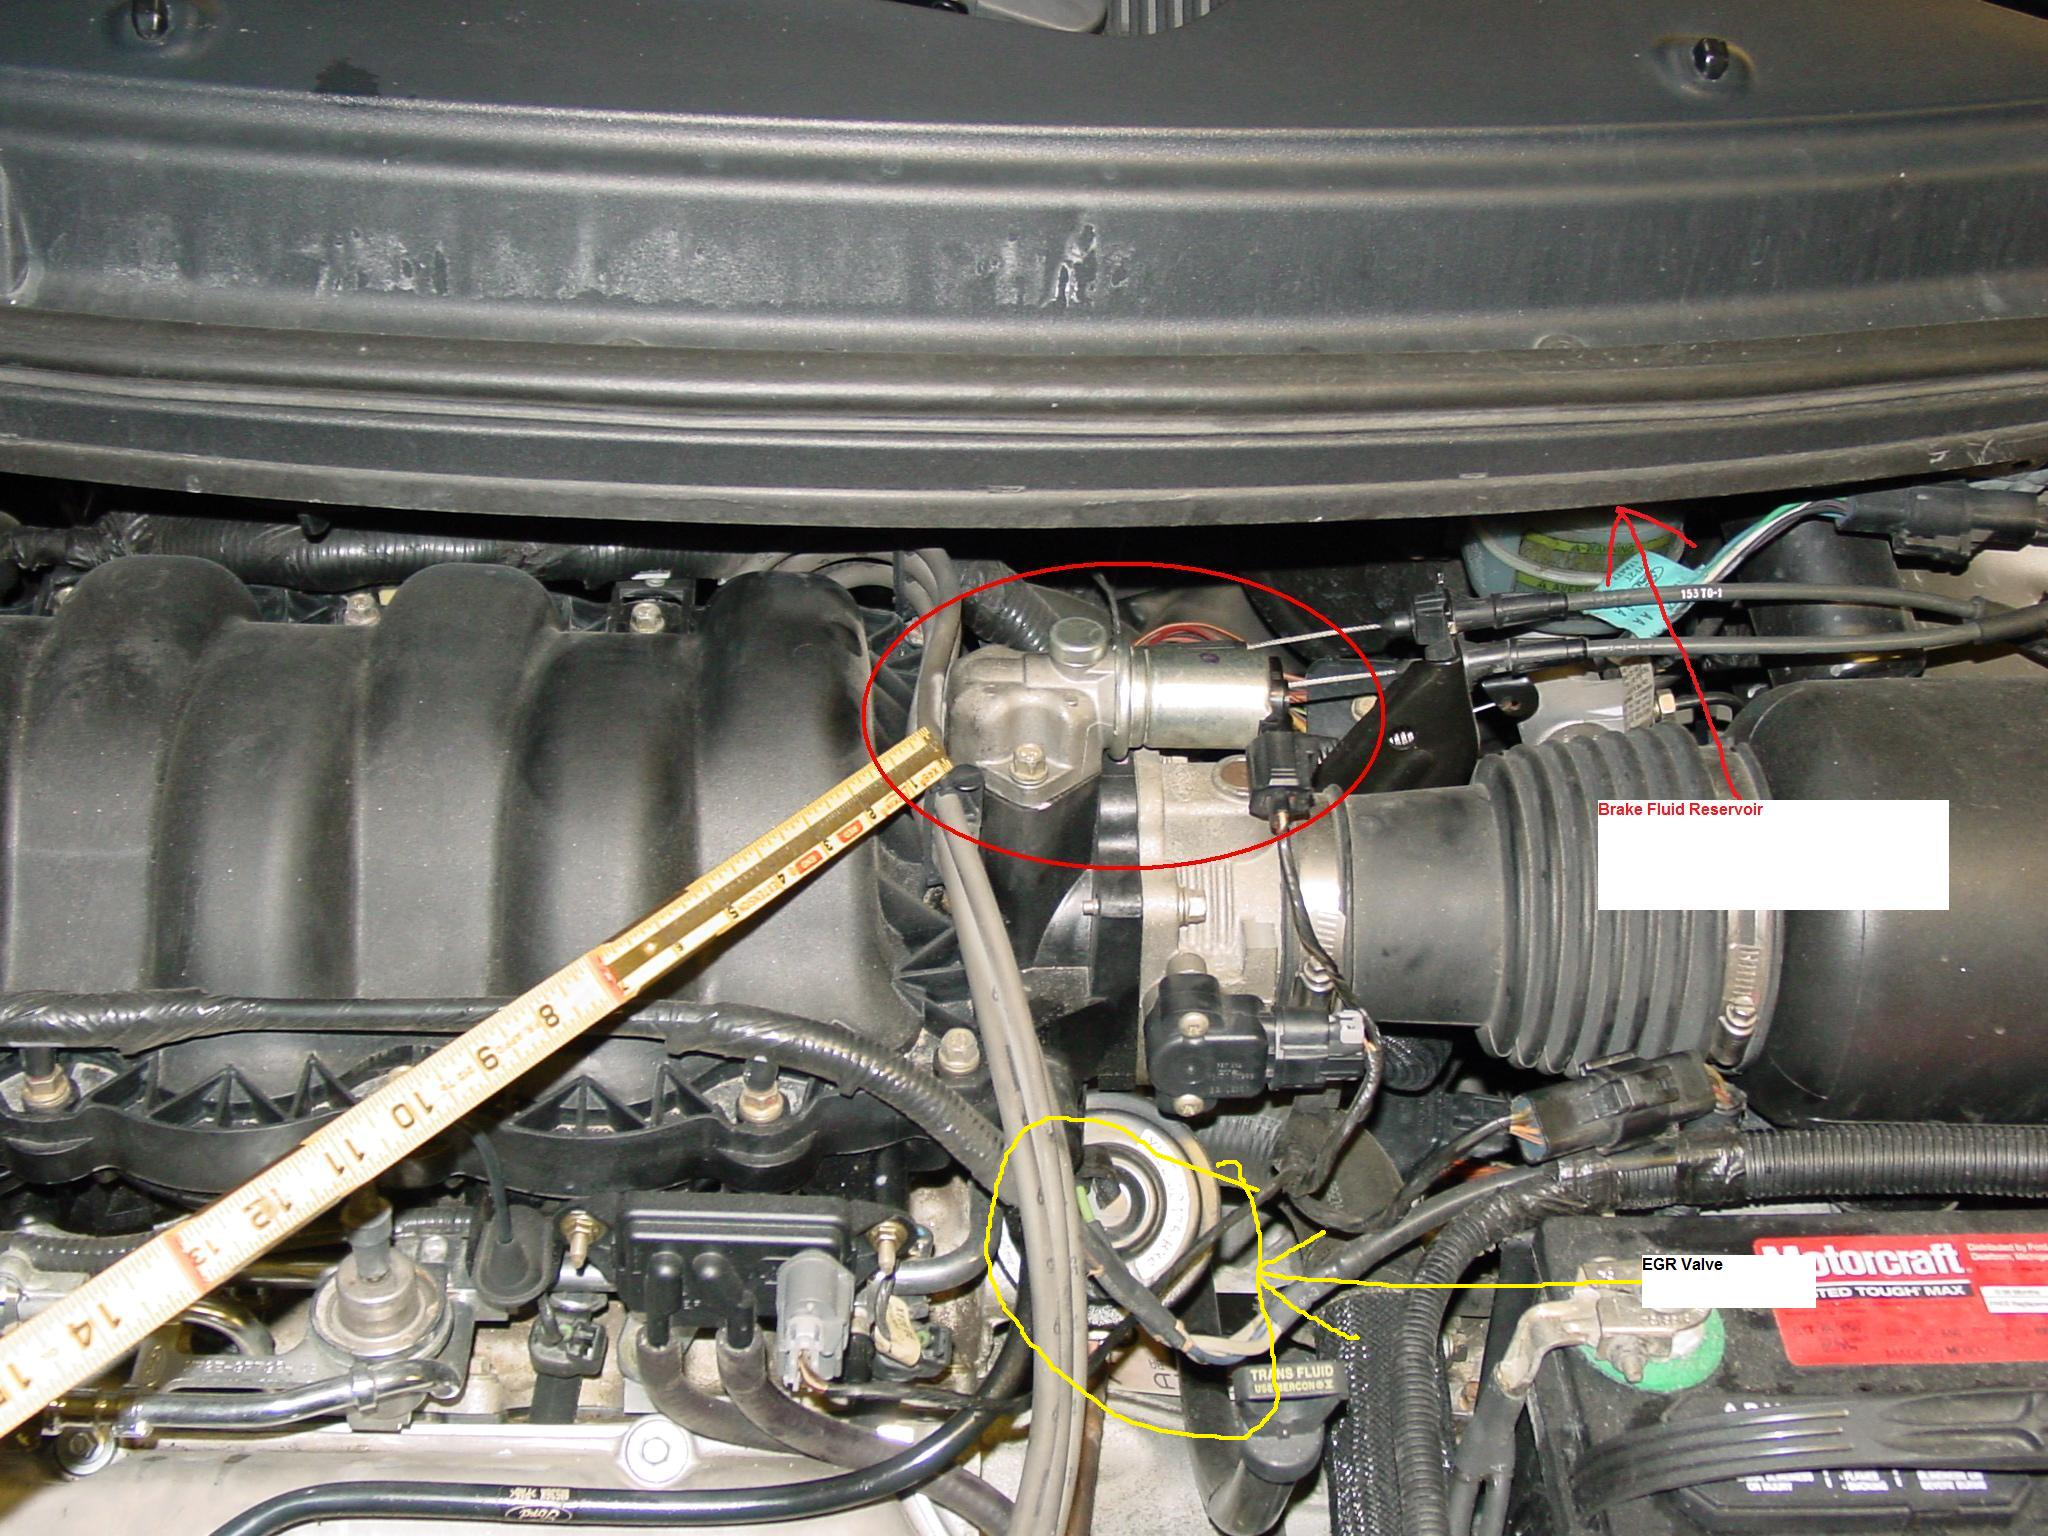 [SCHEMATICS_4FR]  TV_7298] 2003 Ford Explorer Fuel Filter Location Schematic Wiring | Ford Windstar Fuel Filter Location |  | Minaga Impa Rele Mohammedshrine Librar Wiring 101